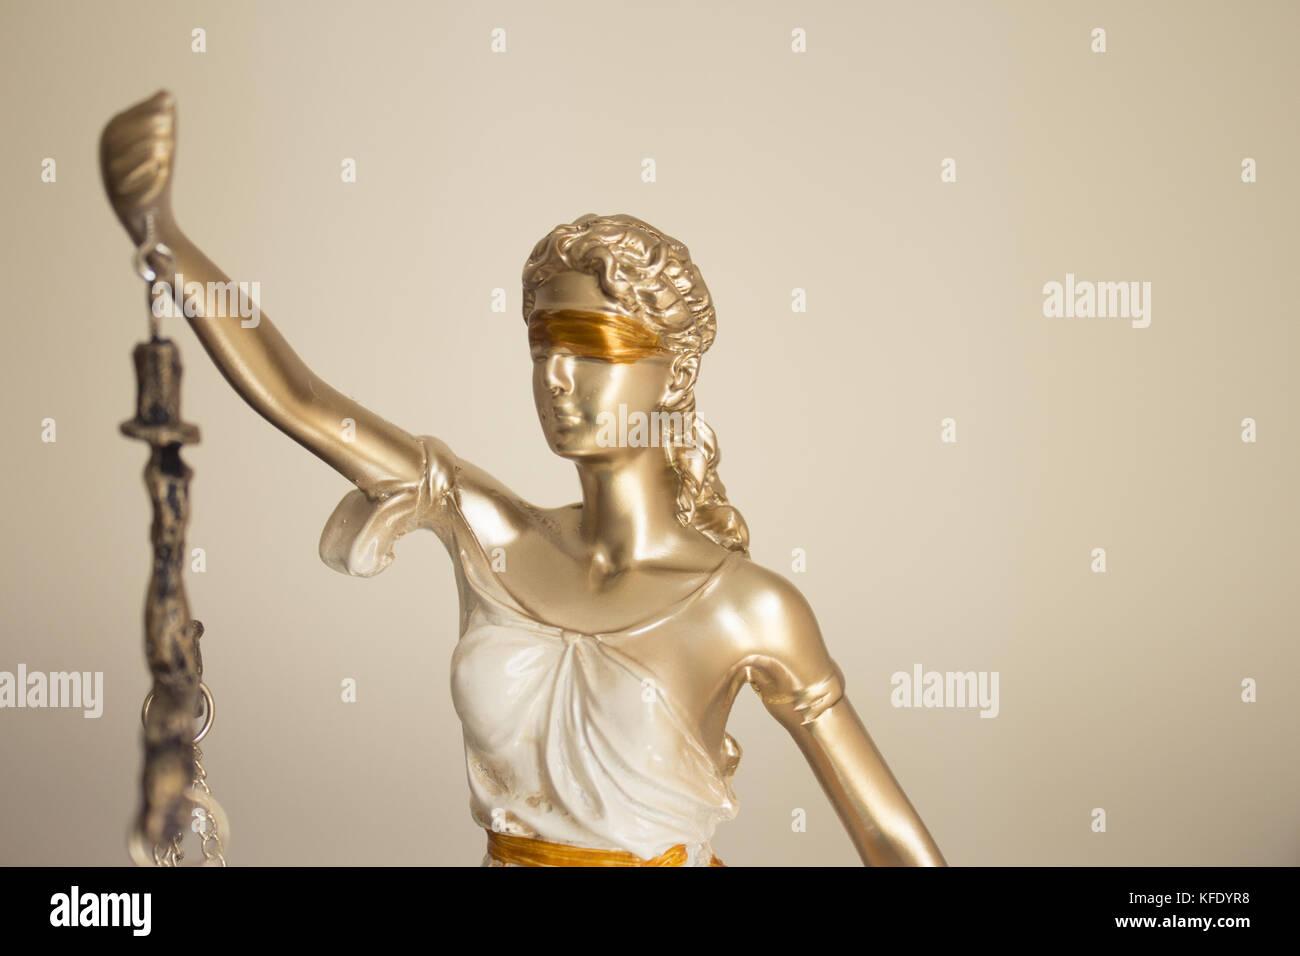 White Female Statue Symbol Of Justice Themis This Figure Has Not